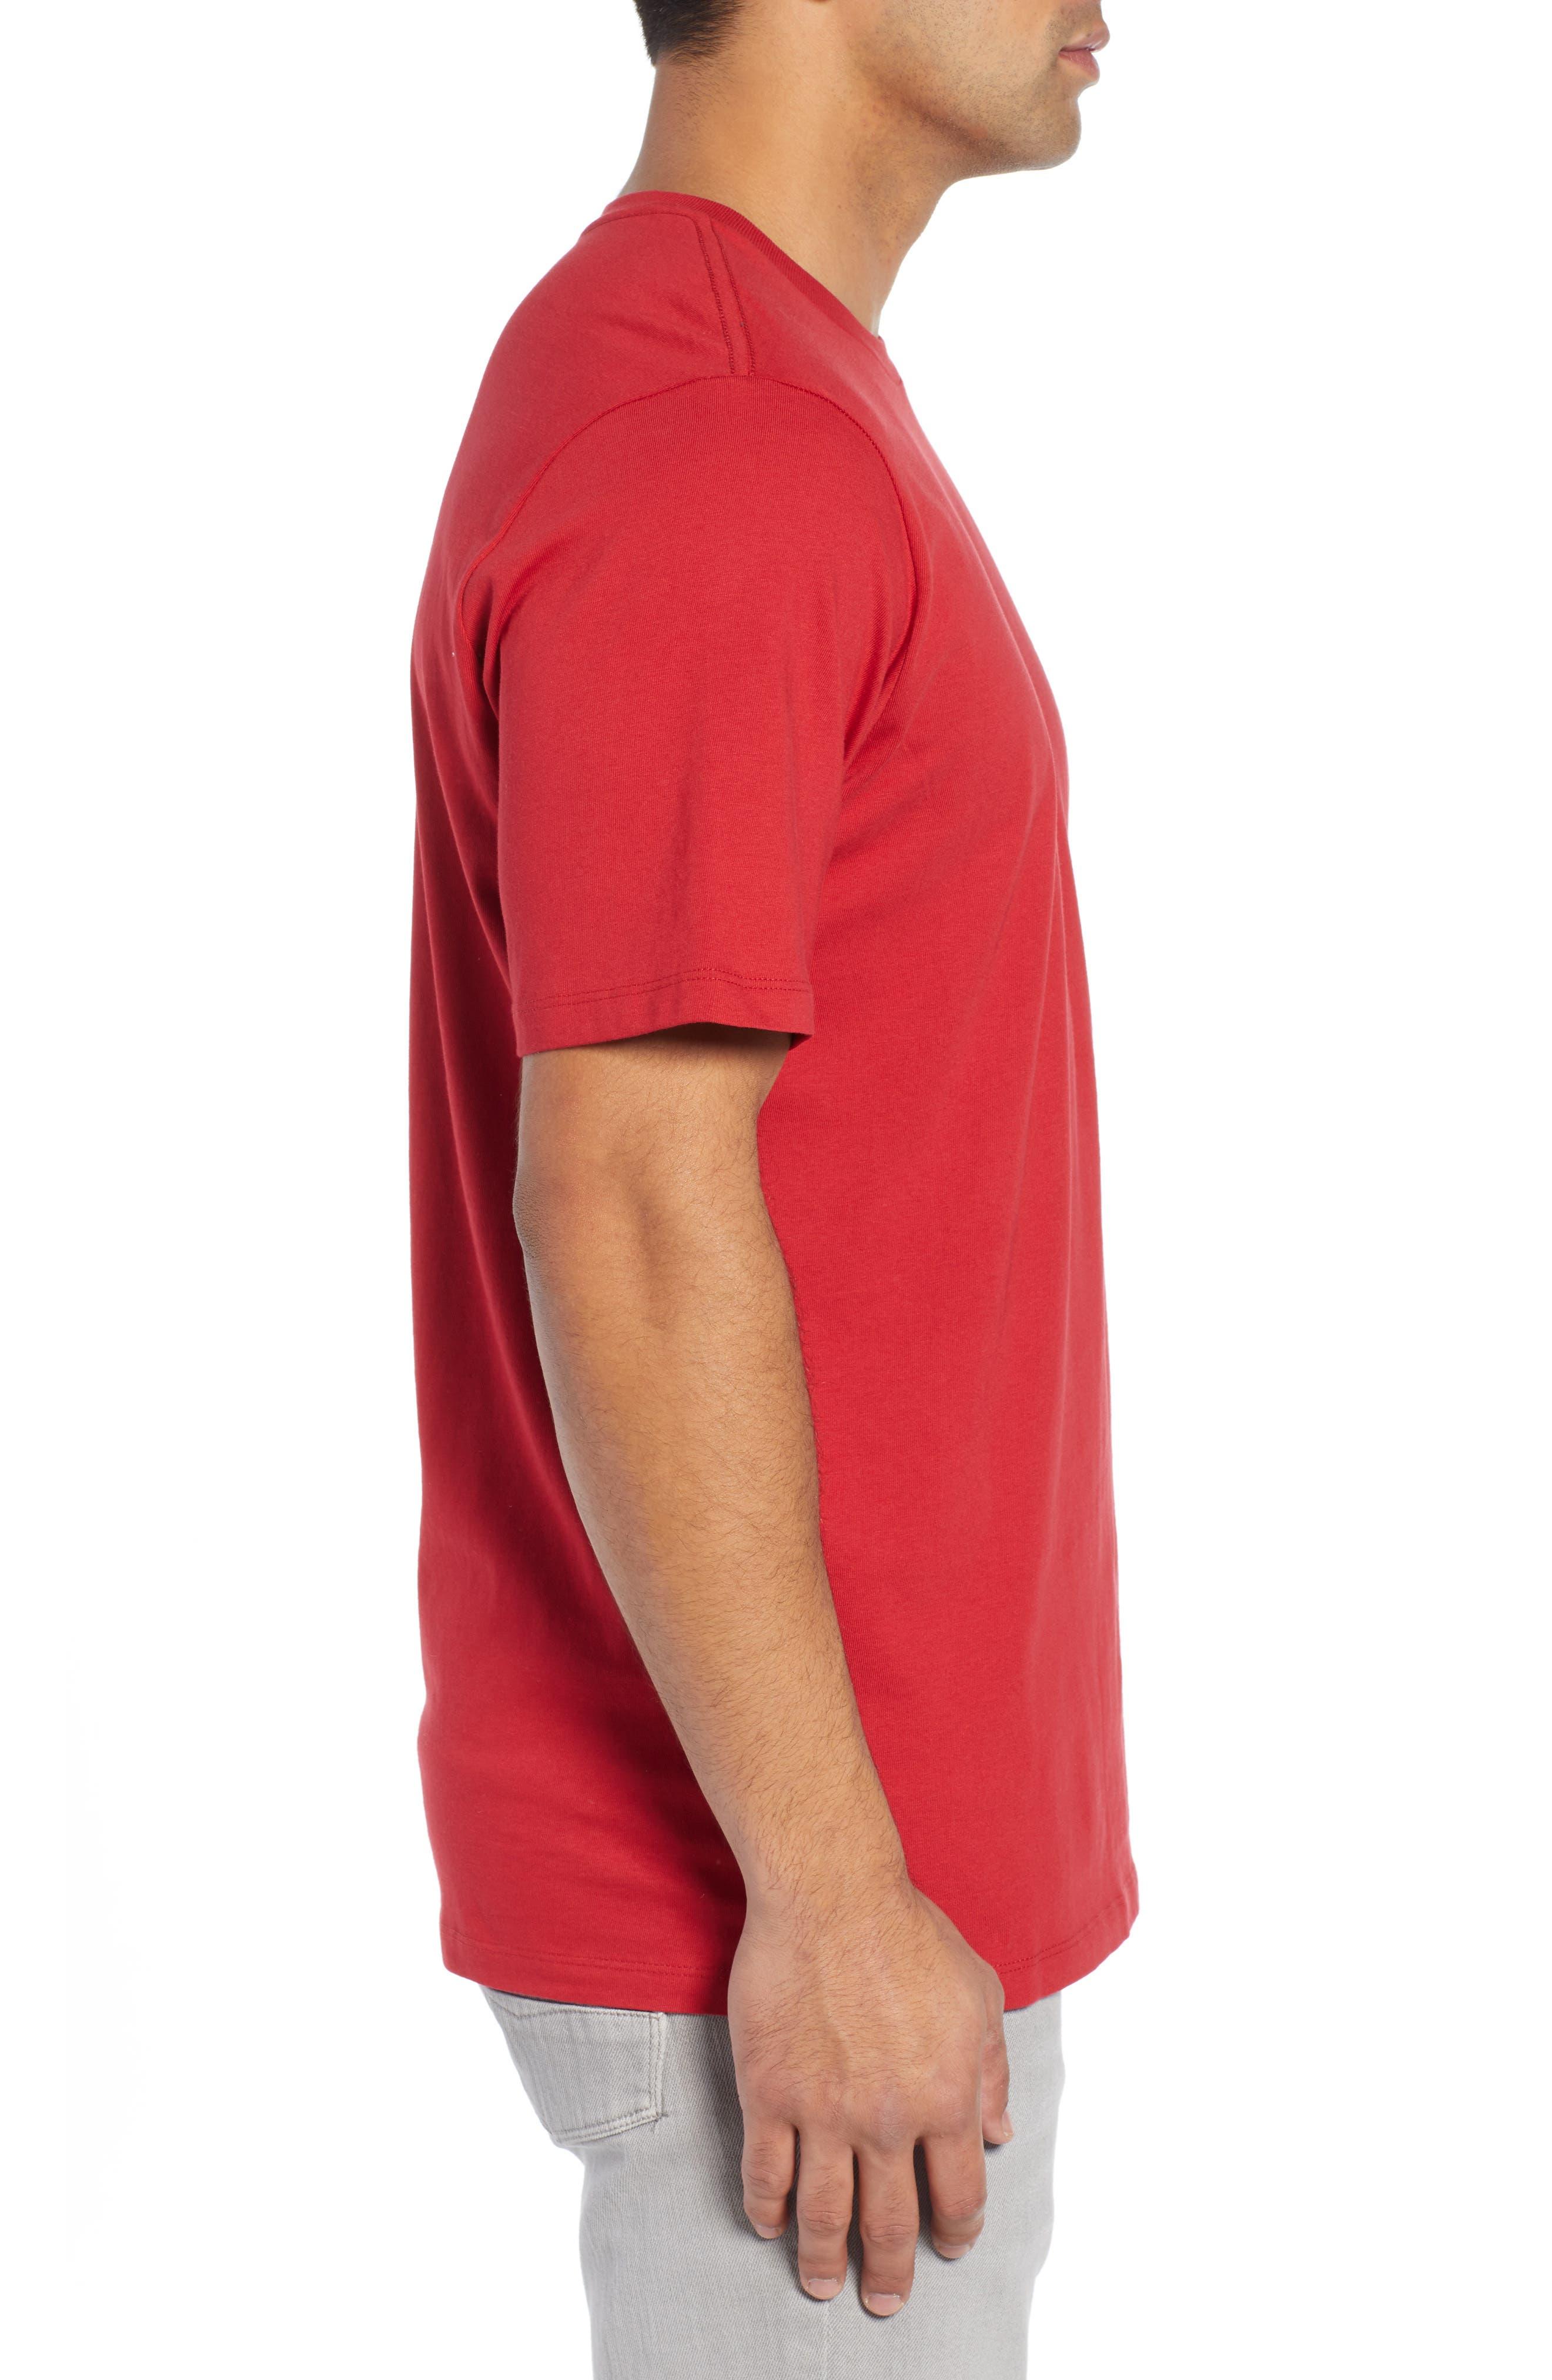 TOMMY BAHAMA, Alo-Ho Ho-Ha Graphic T-Shirt, Alternate thumbnail 3, color, SCOOTER RED